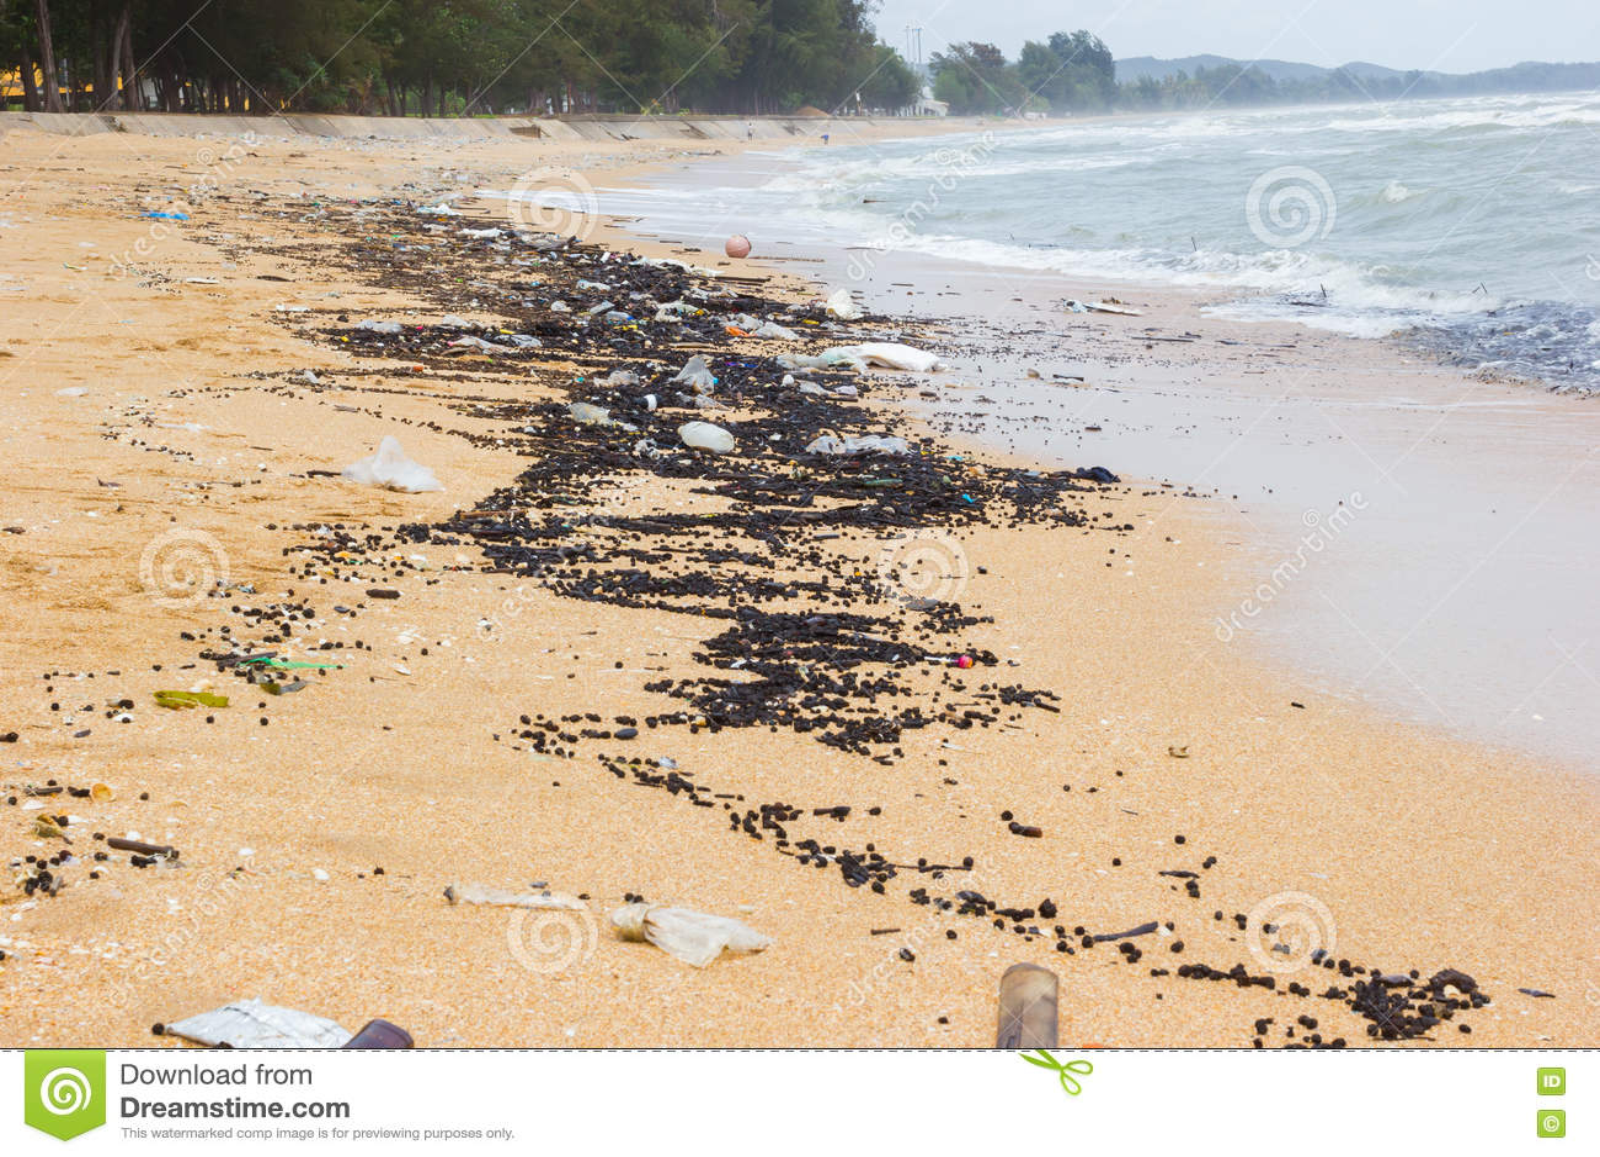 Download Загрязнение на пляже тропического моря, пляжа Chanthaburi, Thail Стоковое Изображение - изображение насчитывающей природа, место: 72292613